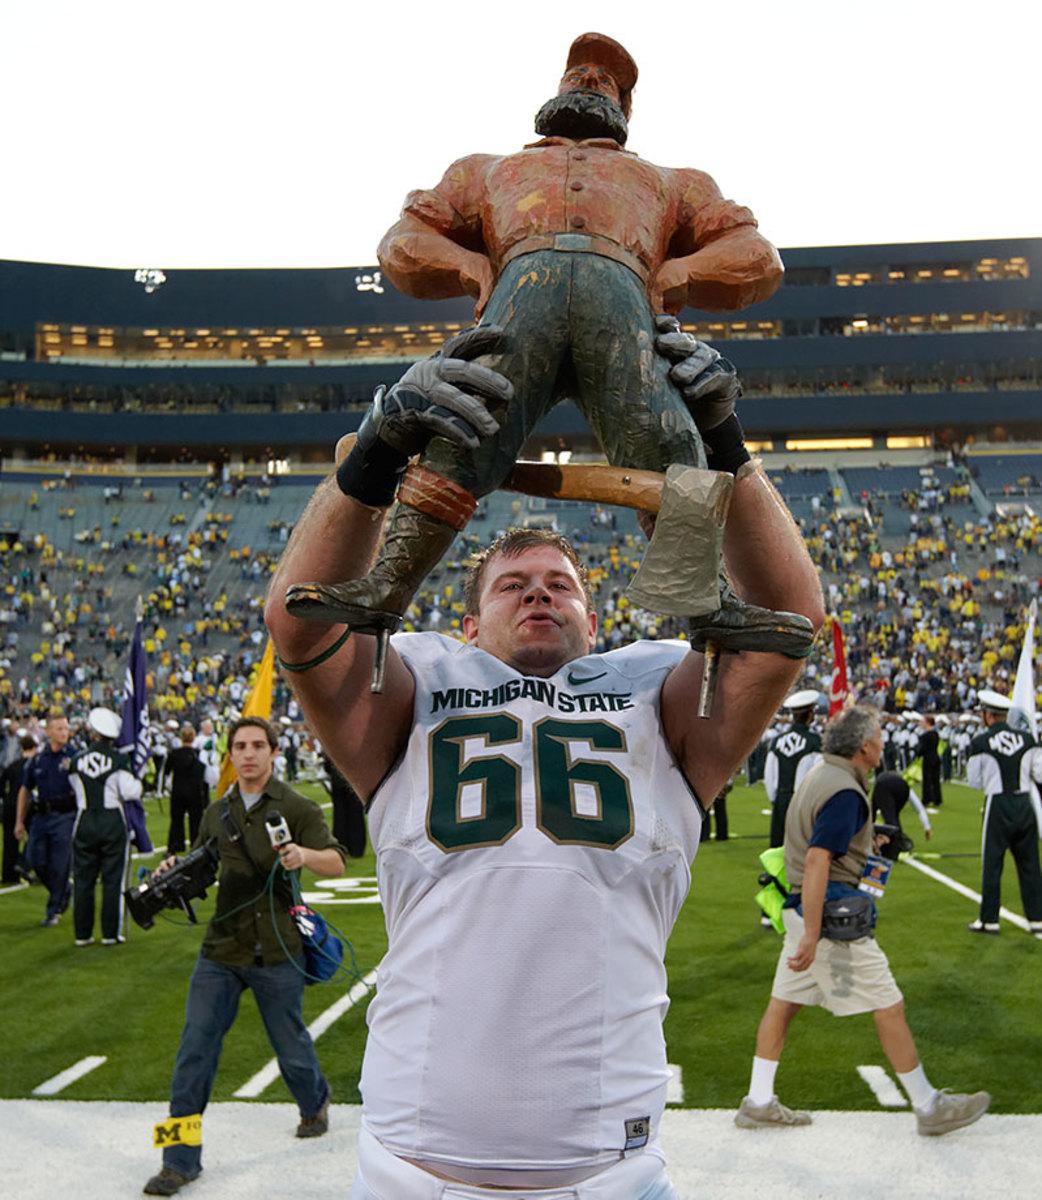 Paul-Bunyan-Trophy-Michigan-State-Michigan-John-Stipek-opy7-3357.jpg